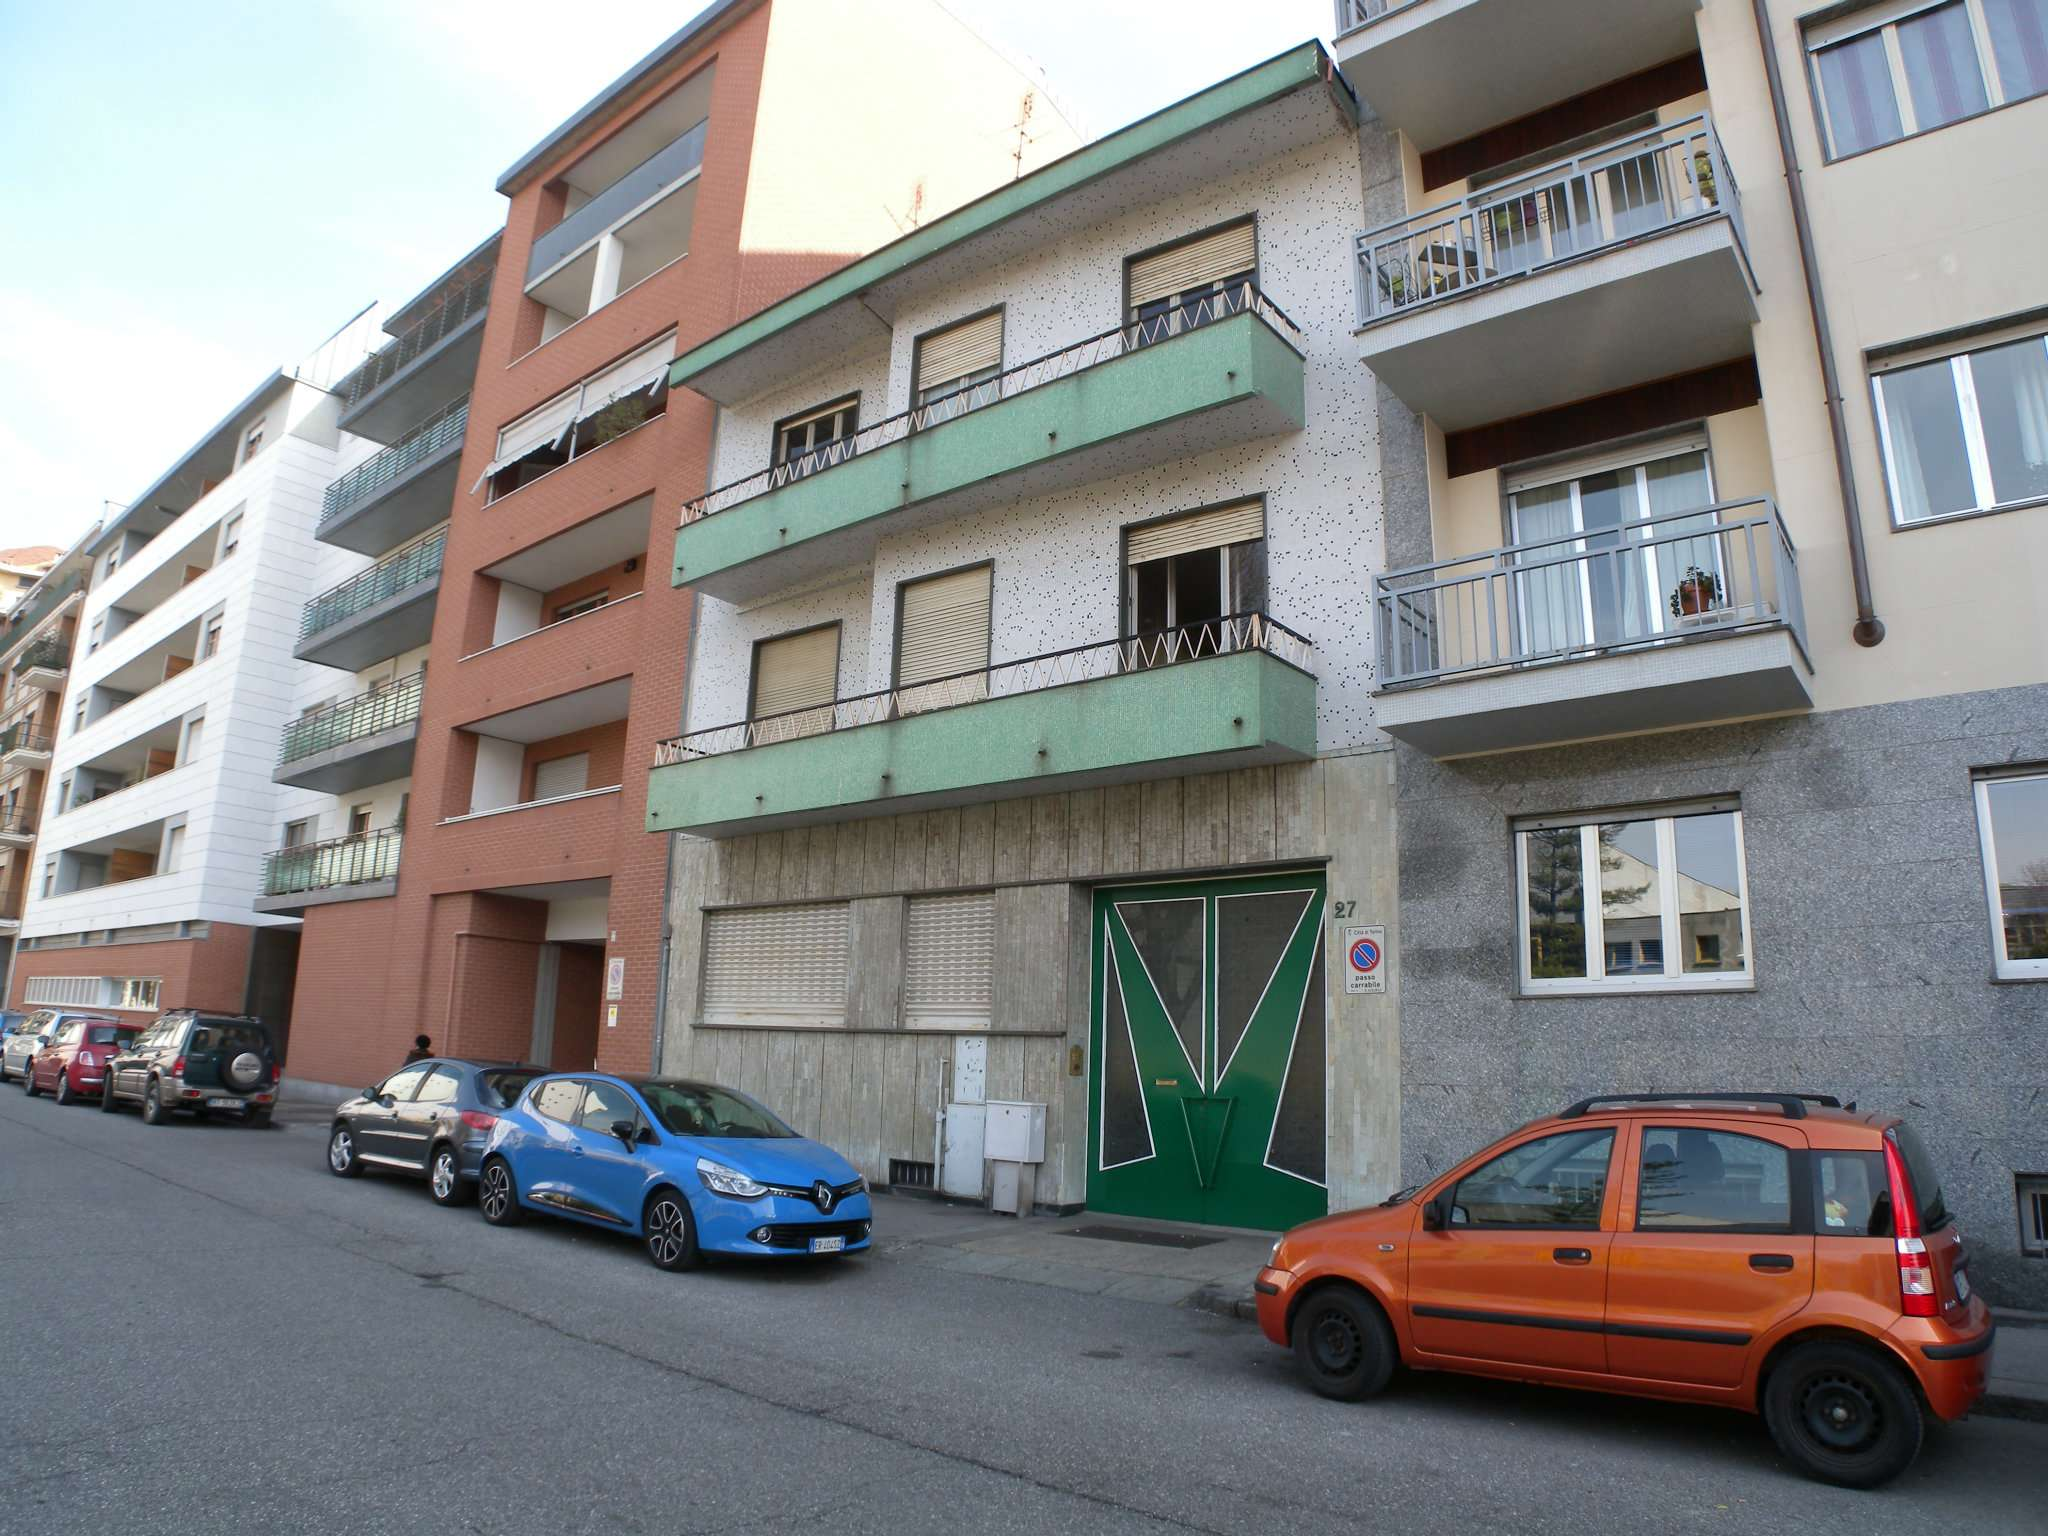 Appartamento in vendita Zona Cenisia, San Paolo - via villarfocchiardo Torino